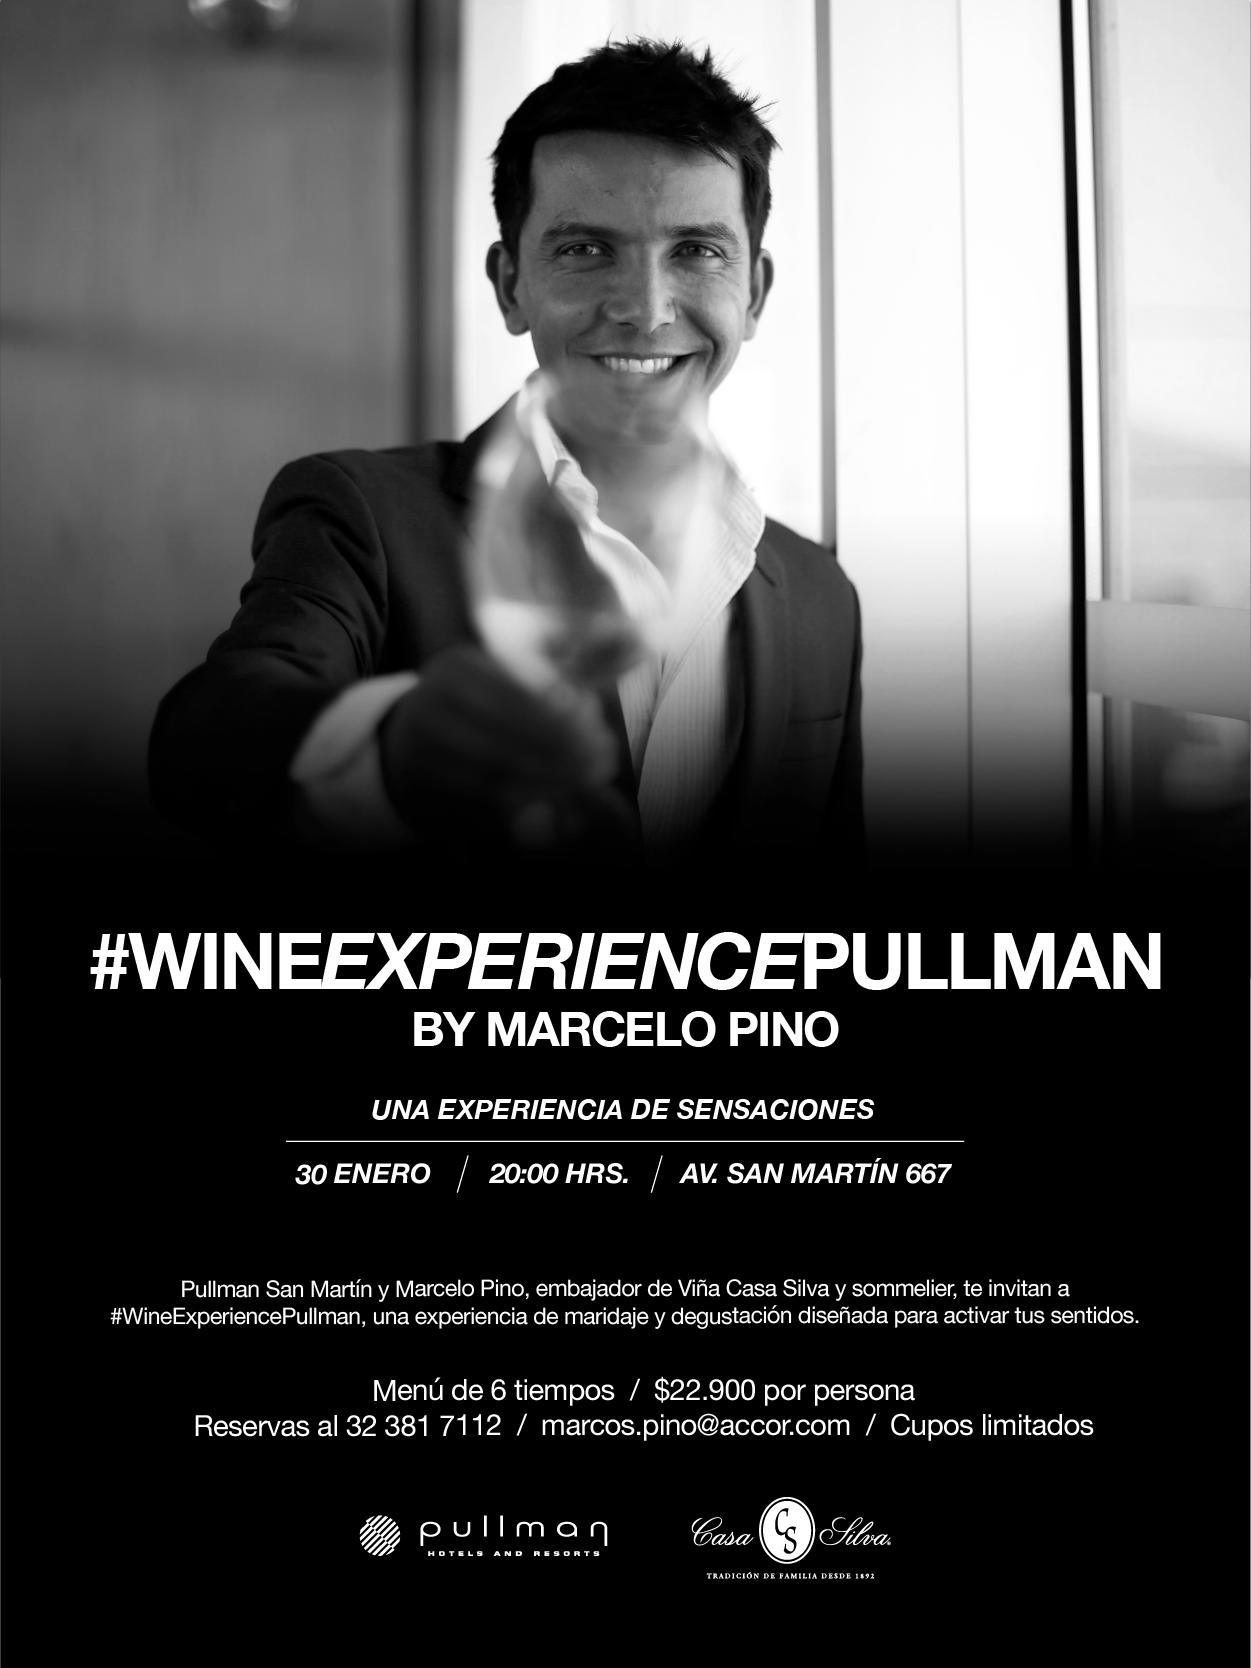 La experiencia del vino llega a Pullman Viña del Mar.